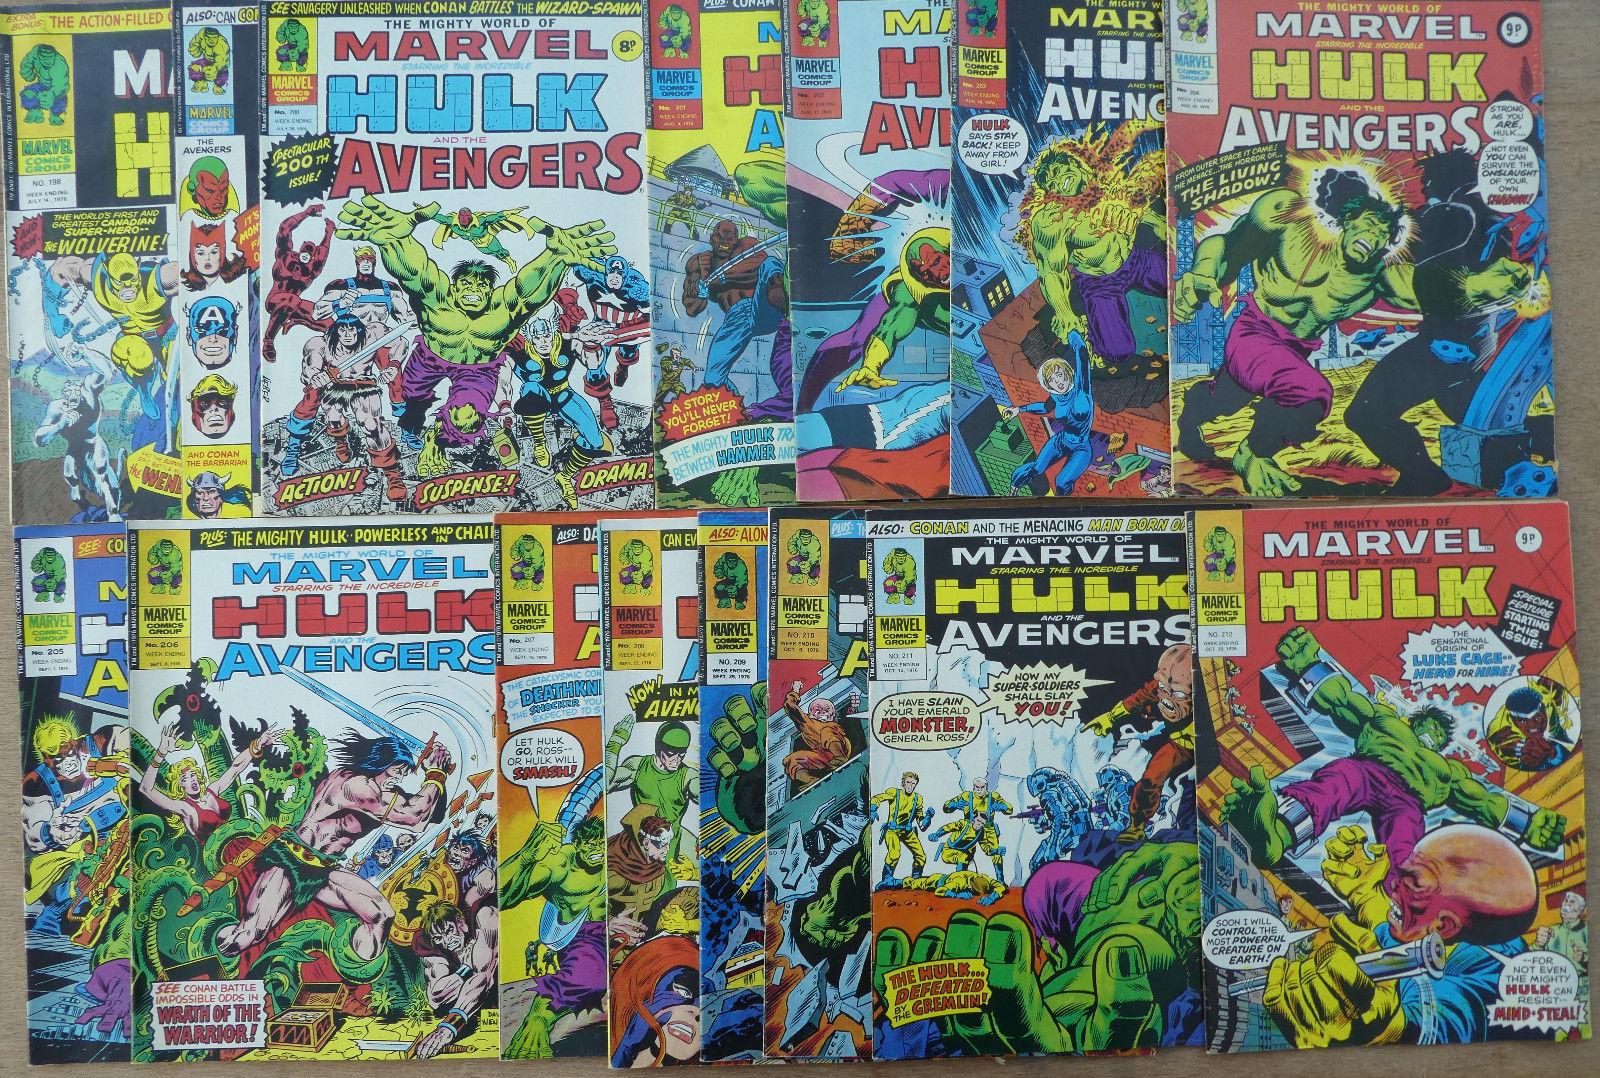 THE  HULK (THE MIGHTY WORLD OF MARVEL #198-212), FINE, 1976, 15 comics, UK wkly